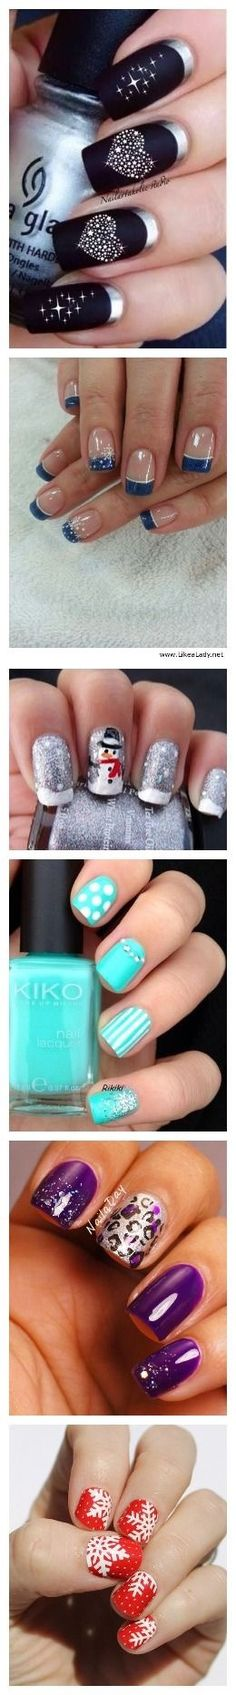 Introducing The Glamorous World Of Nail Art Luxury Beauty - winter nails - Cute Nail Art, Nail Art Diy, Easy Nail Art, Diy Nails, Cute Nails, Pretty Nails, Nail Art Designs 2016, Cute Nail Designs, Simple Designs